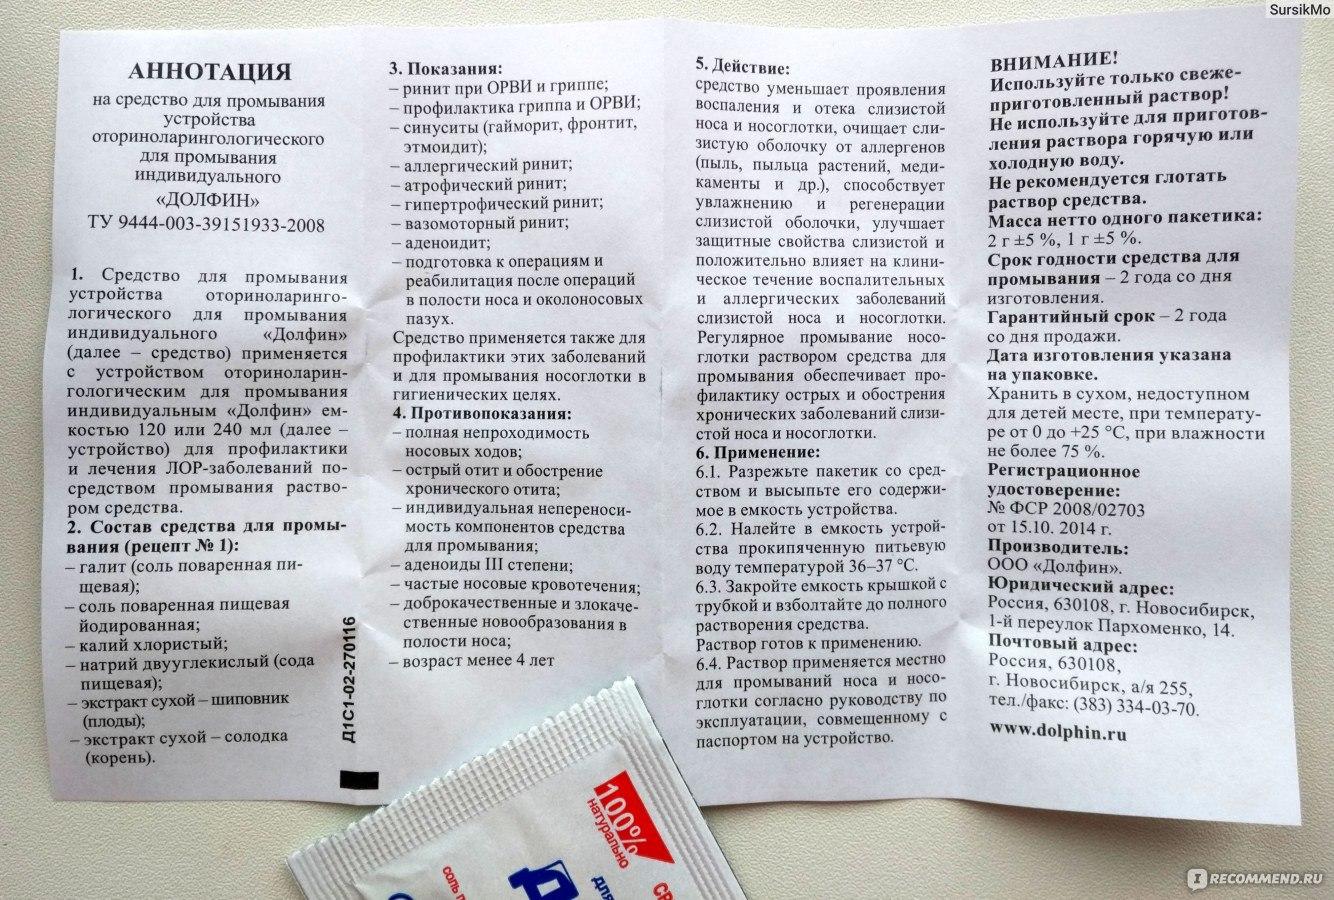 инструкция на хлоргексидин от росбио